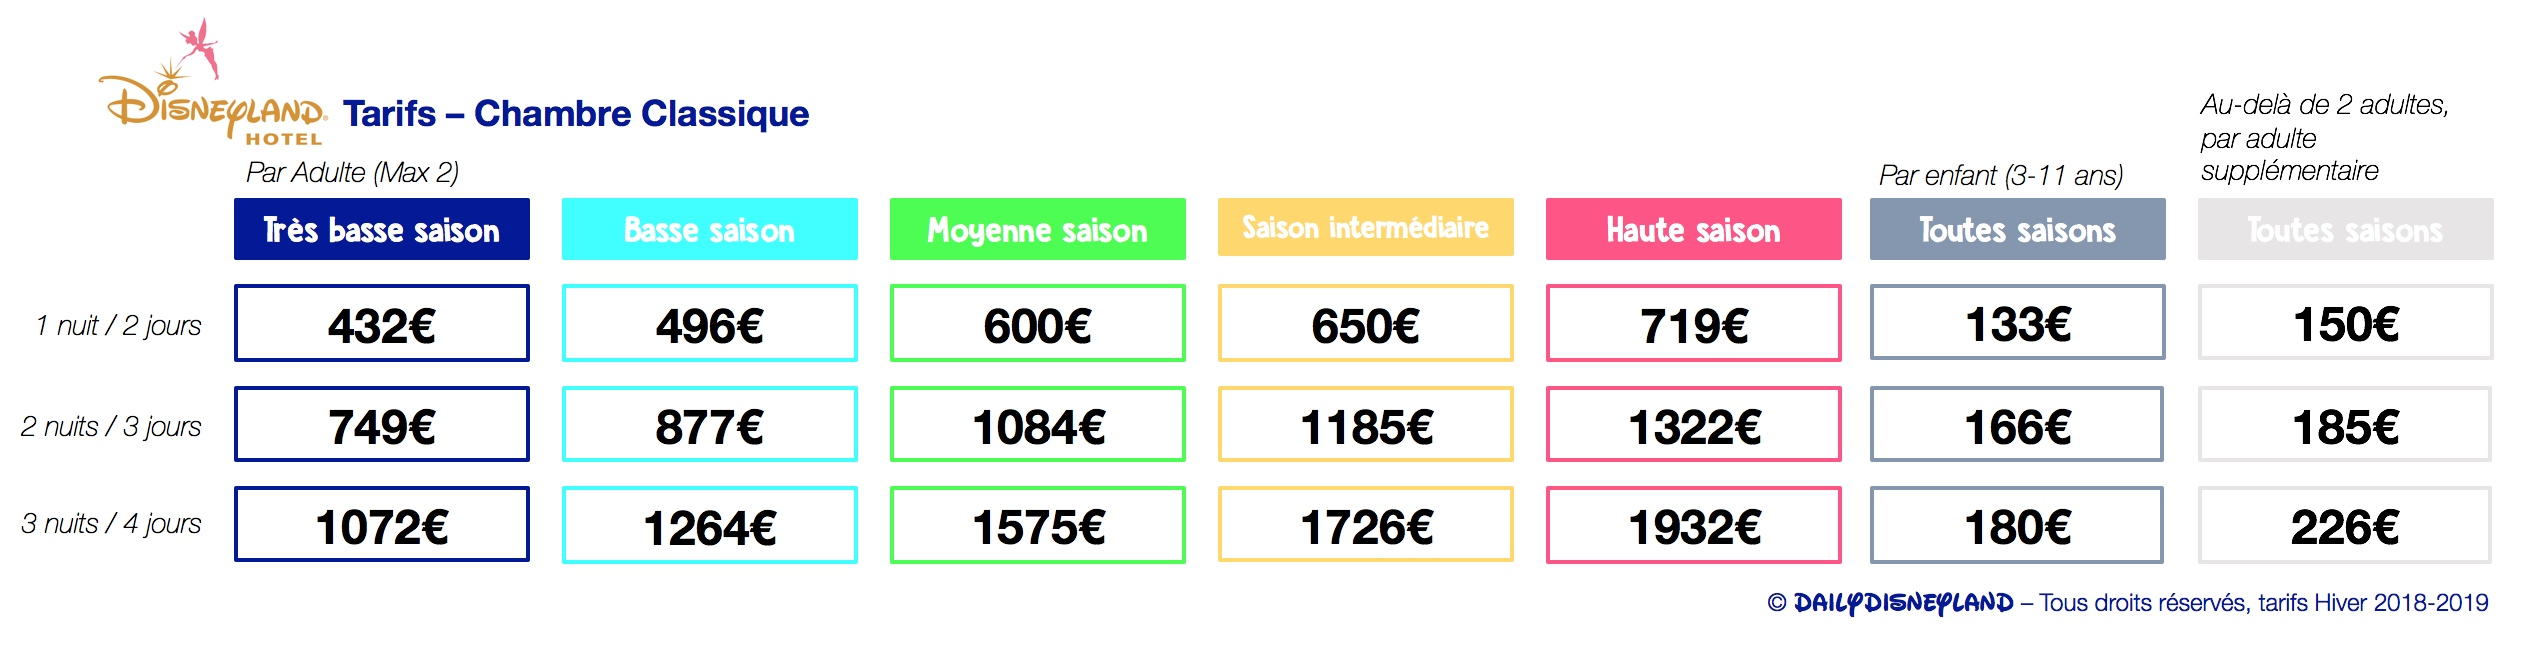 Disneyland Paris tarif